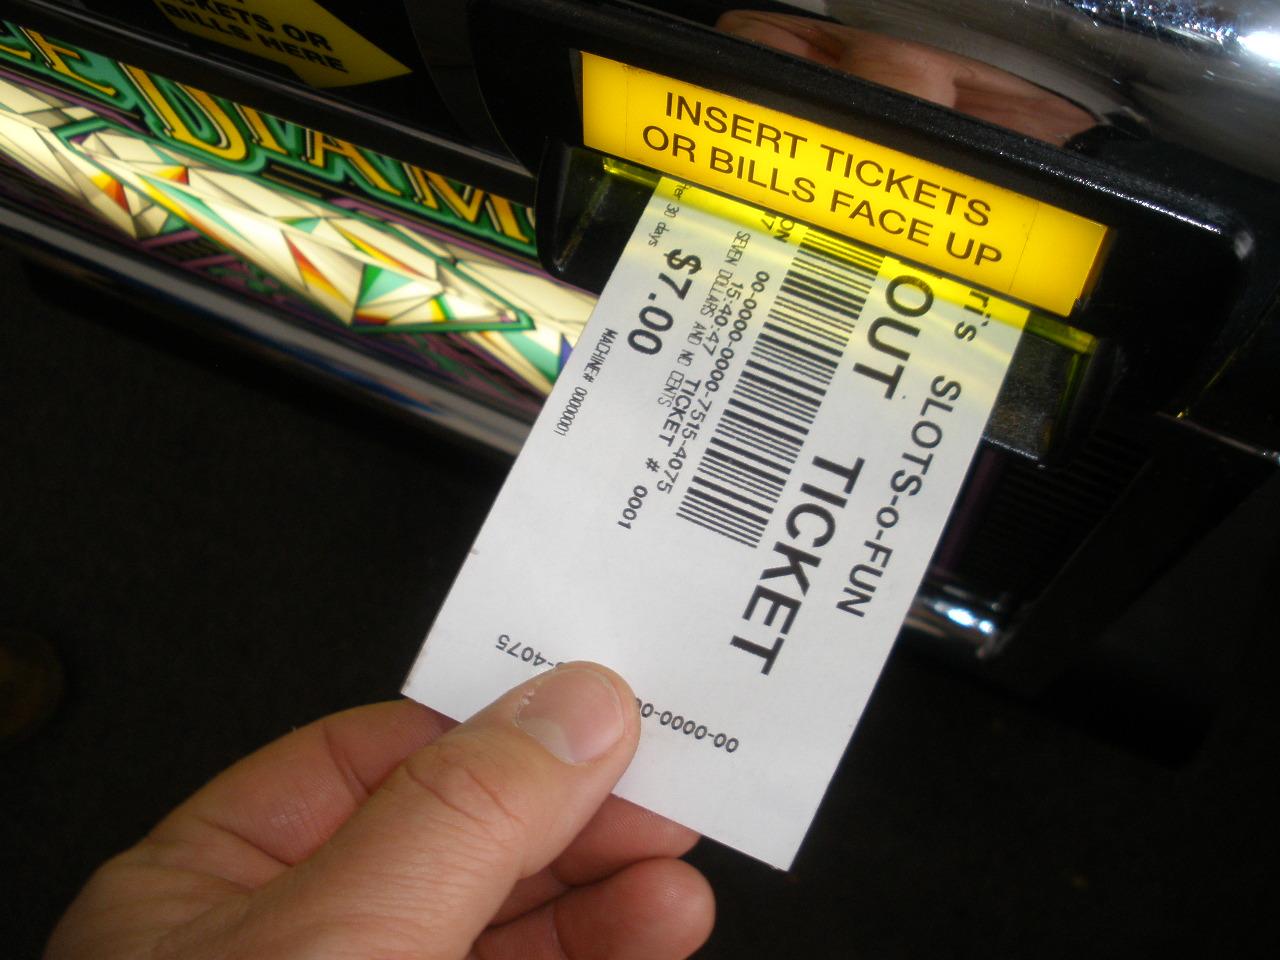 Slot Machine Cash Out Ticket Printer Paper